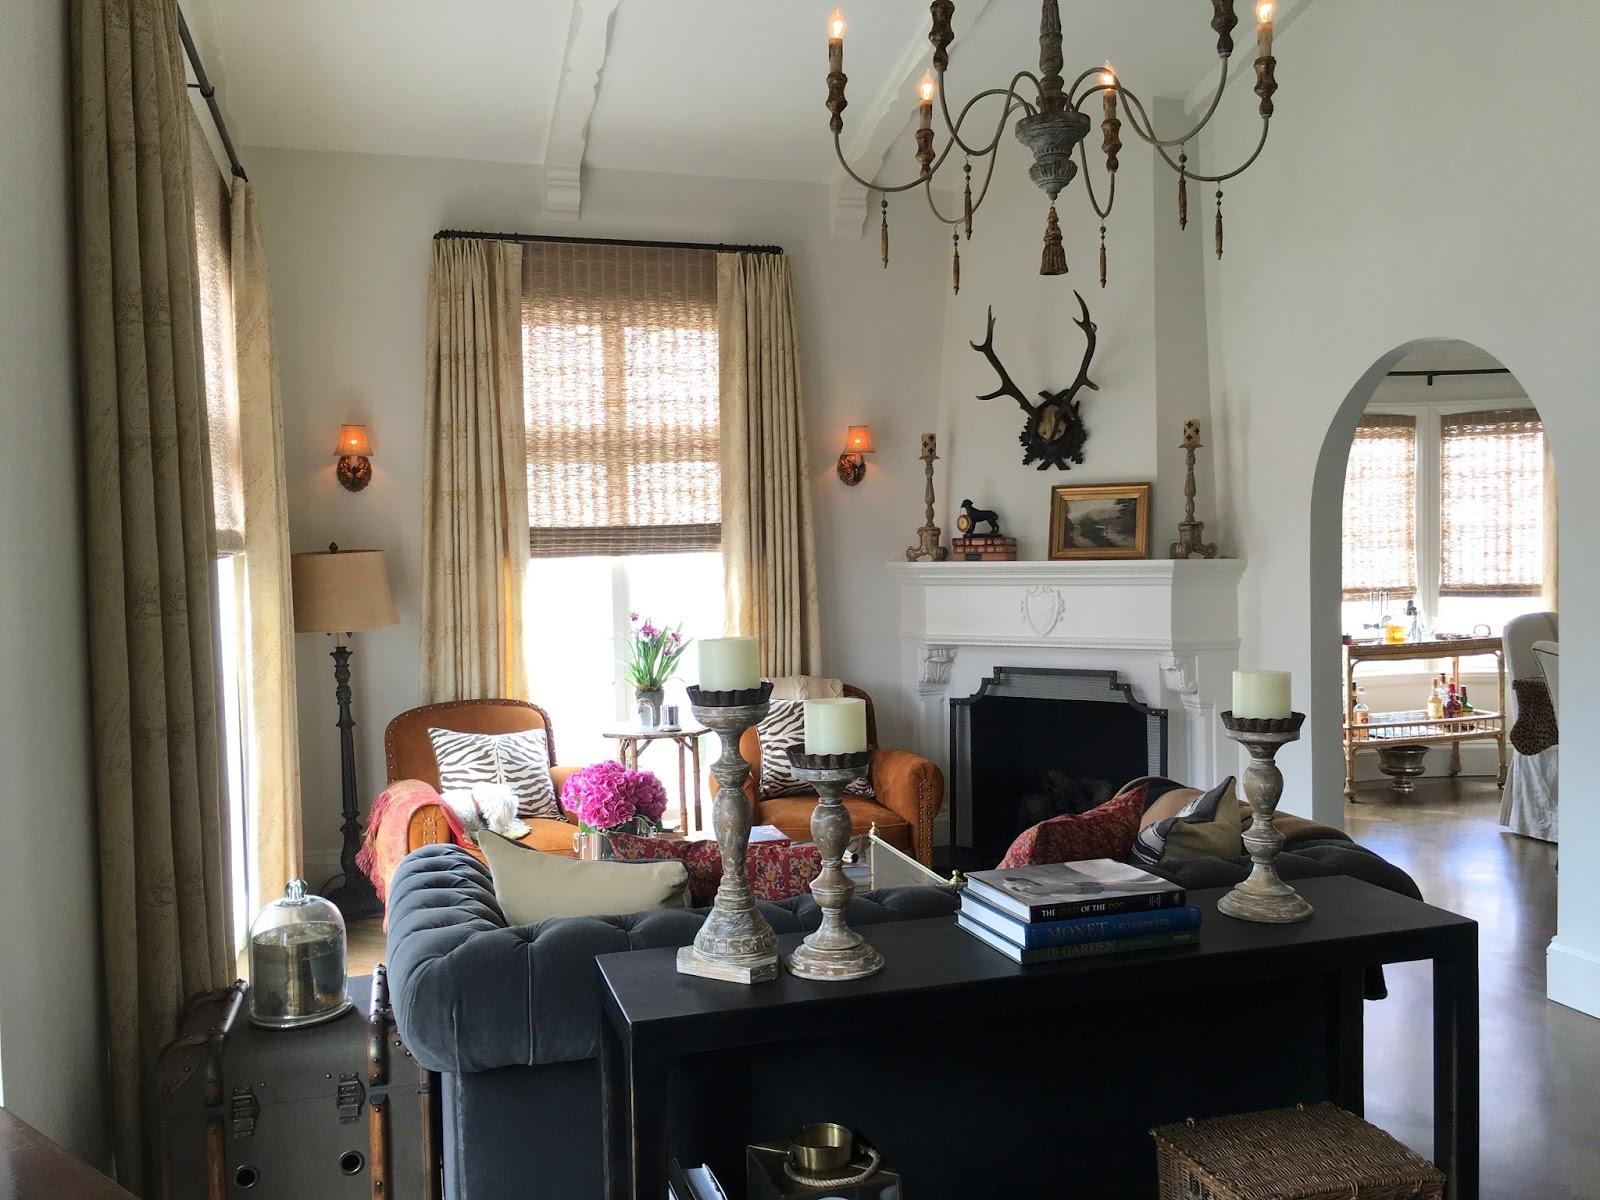 Vignette design the living room san francisco style for Living room today